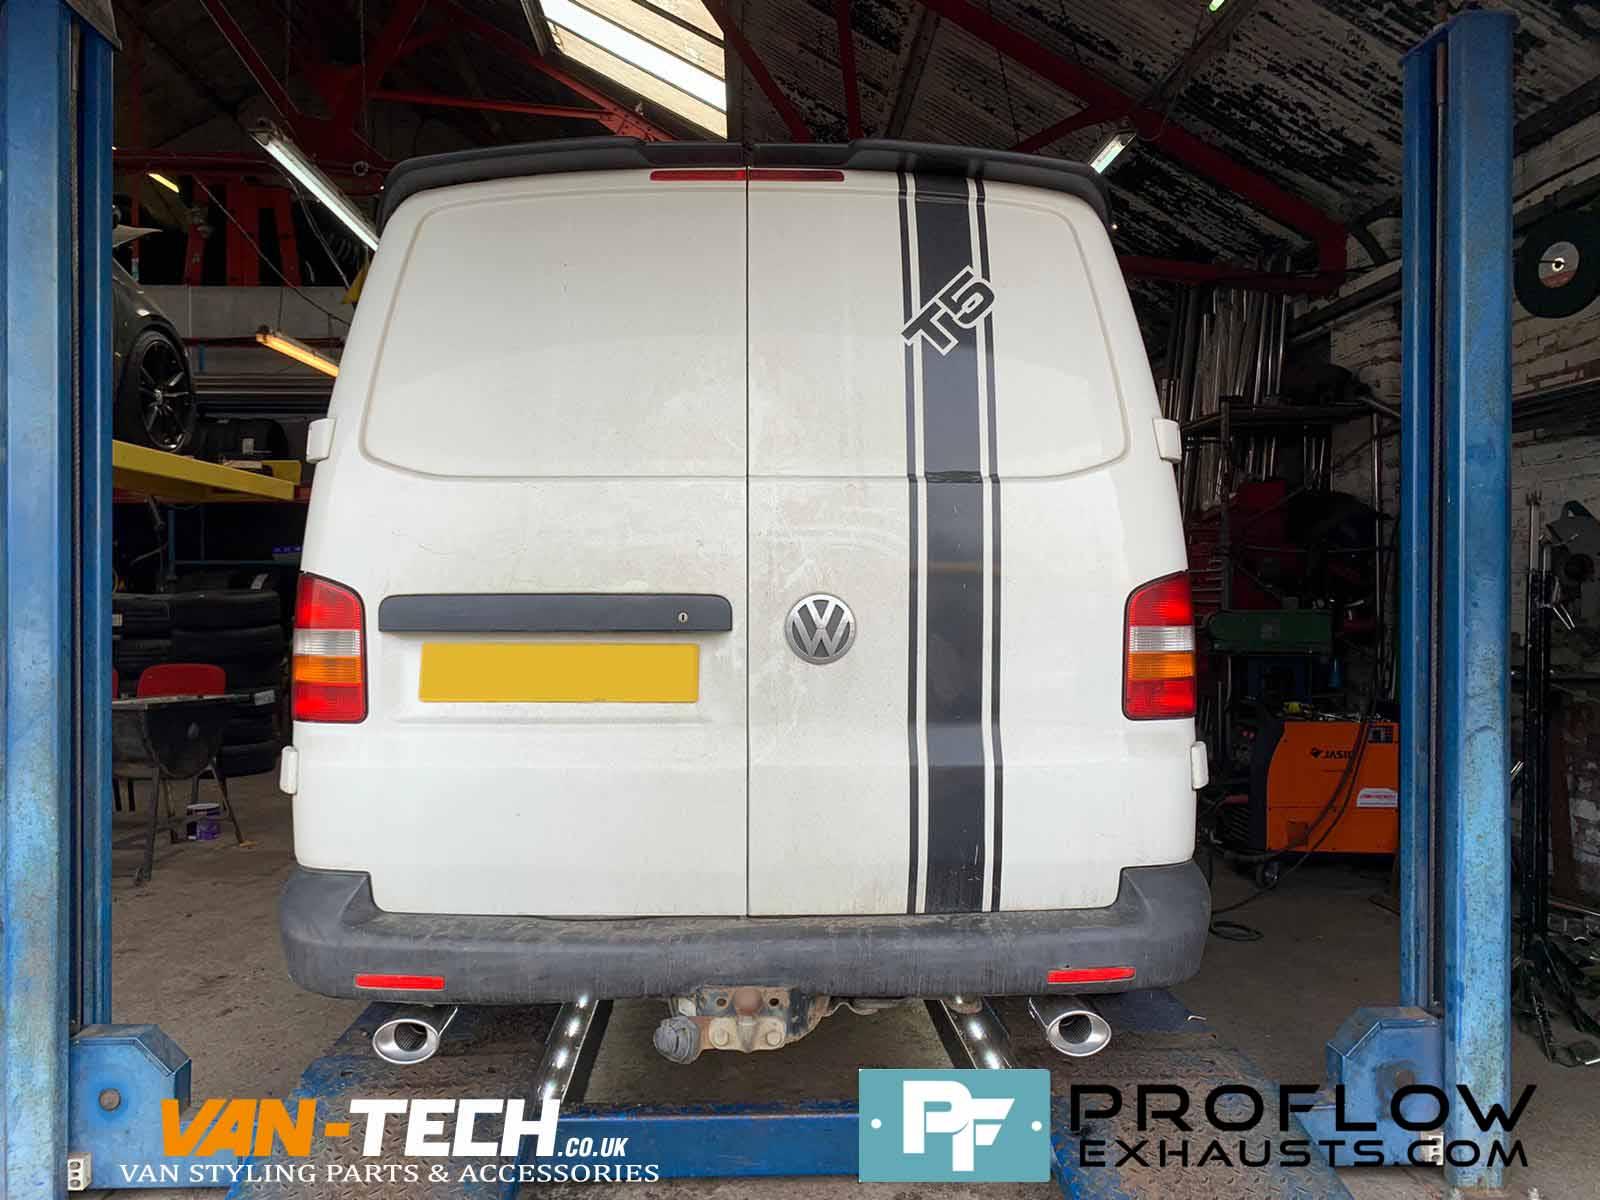 Vw Transporter T5 Custom Built Exhaust Proflow Stainless Steel (1)